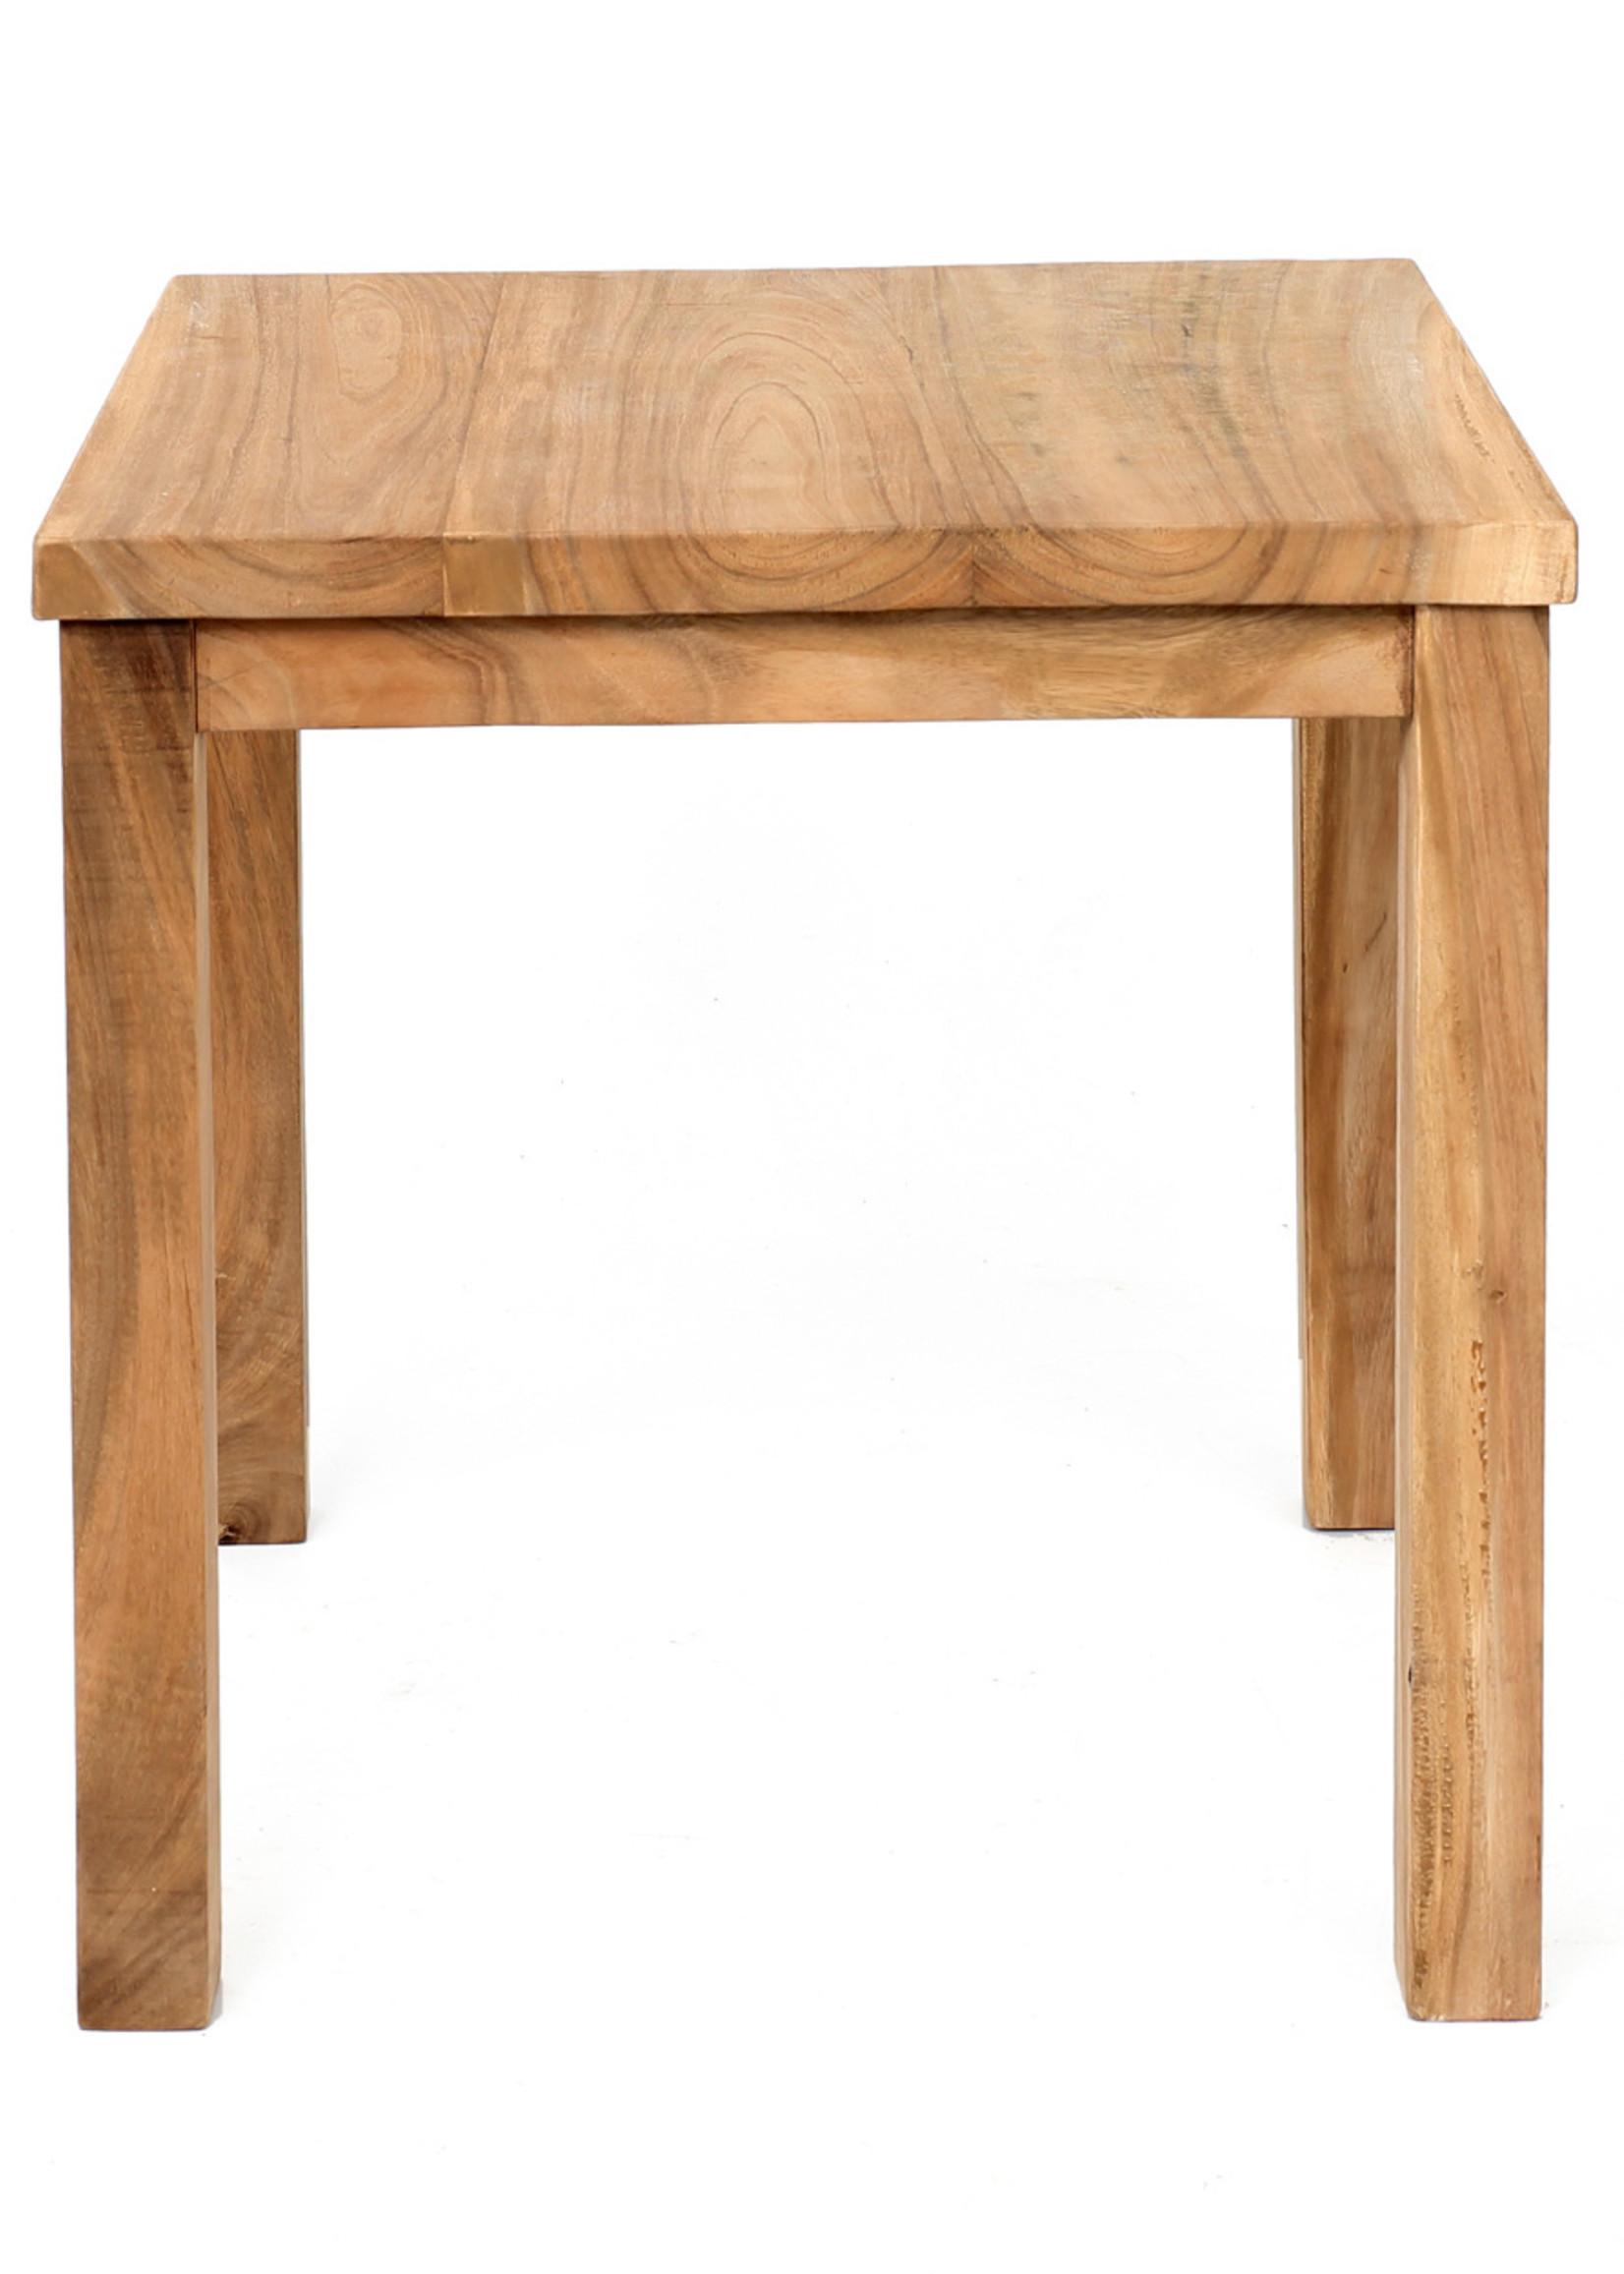 The Suar Sleek Table - Natural